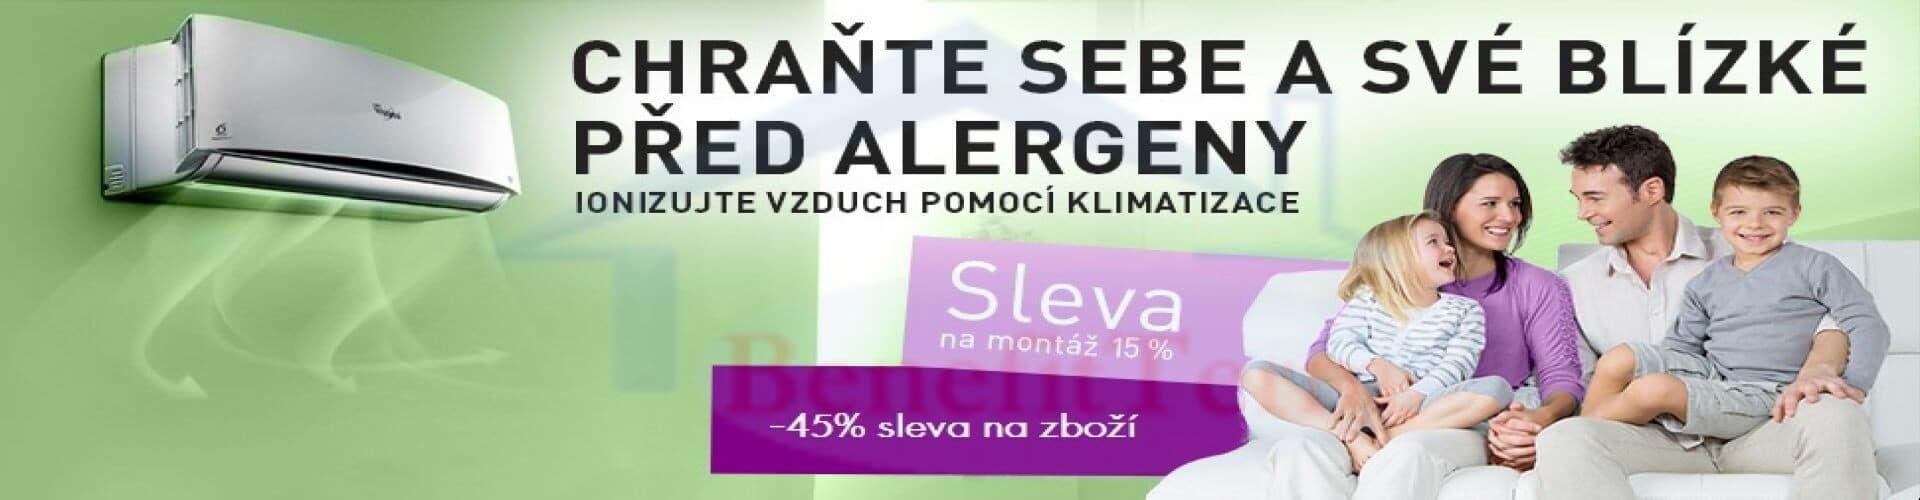 Blog Bterm.cz Montaz a Servis klimatizace